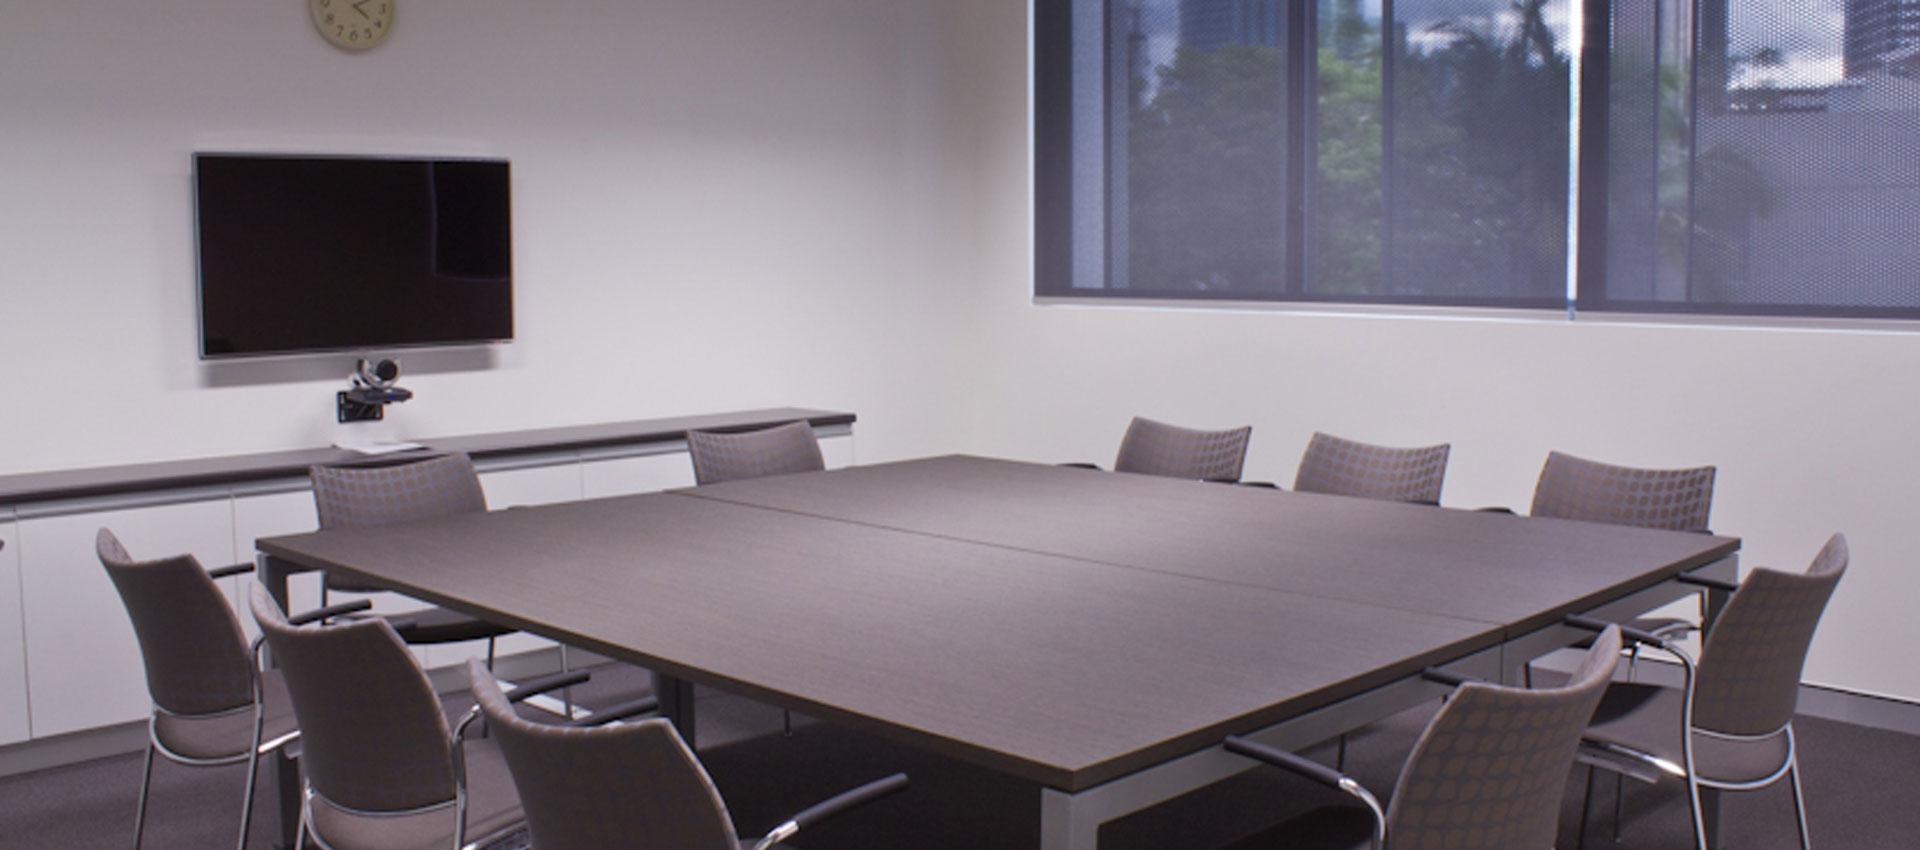 QMC Venue Hire Brisbane Multipurpose - Boardroom